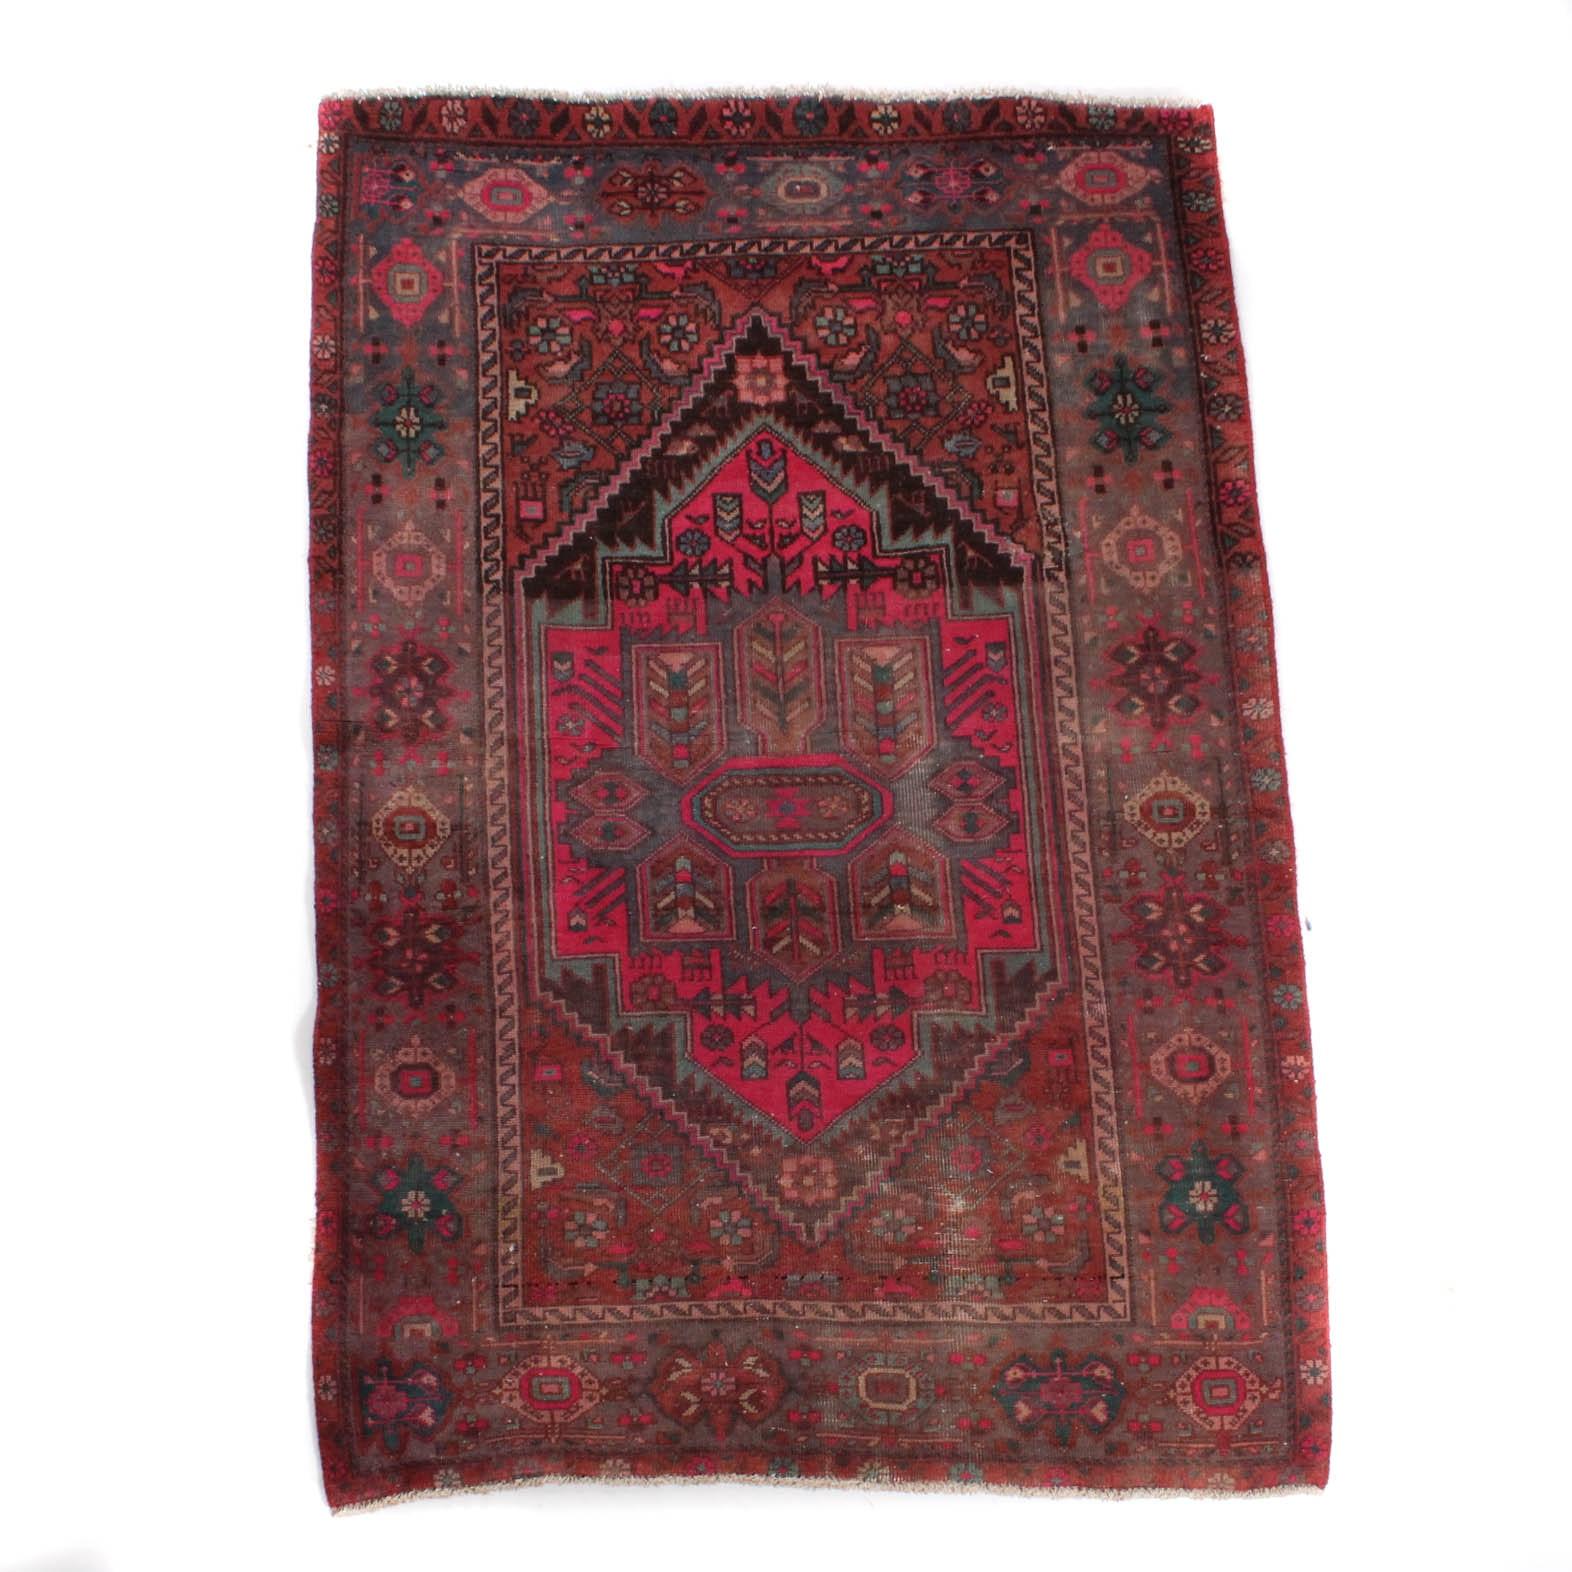 Vintage Hand-Knotted Persian Kurdish Bijar Rug